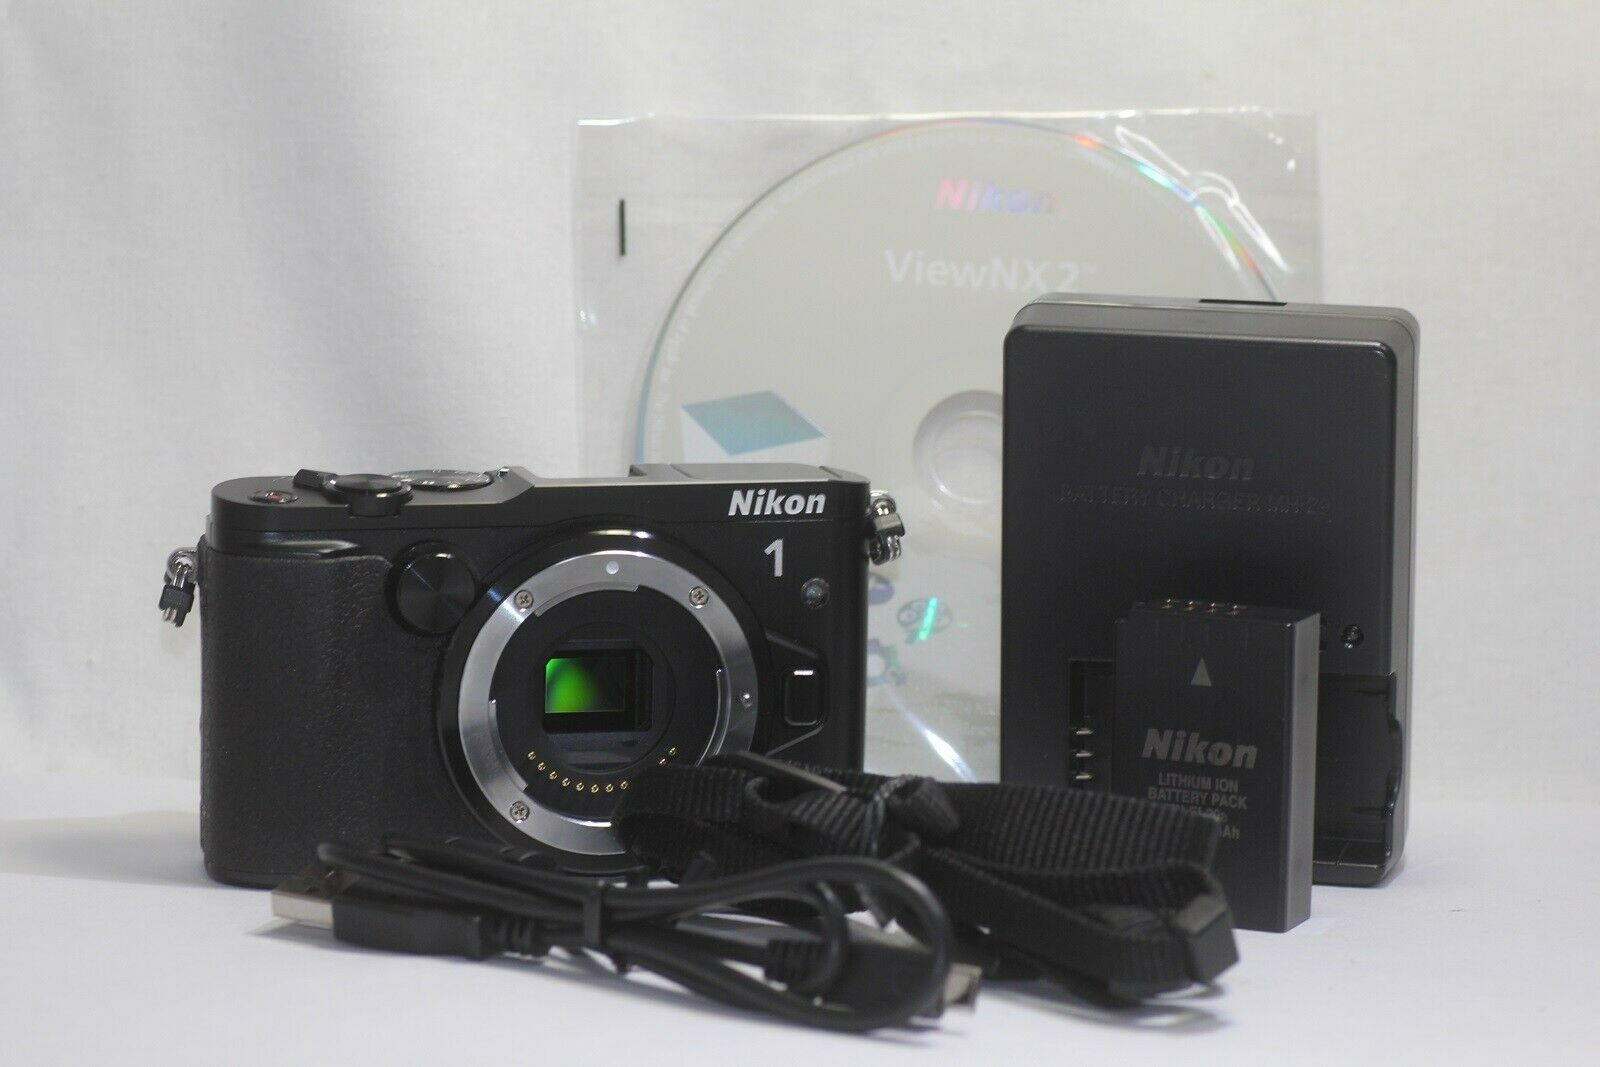 Mirrorless Cameras: Collapsible Mono pod D60 D90 1 V3 D80 D100 Digital SLR D1 Sturdy 72 Monopod Camera Stick with Quick Release for Nikon 1 V1 1 V2 D50 D70 Mono-pod D40X D40 D70s